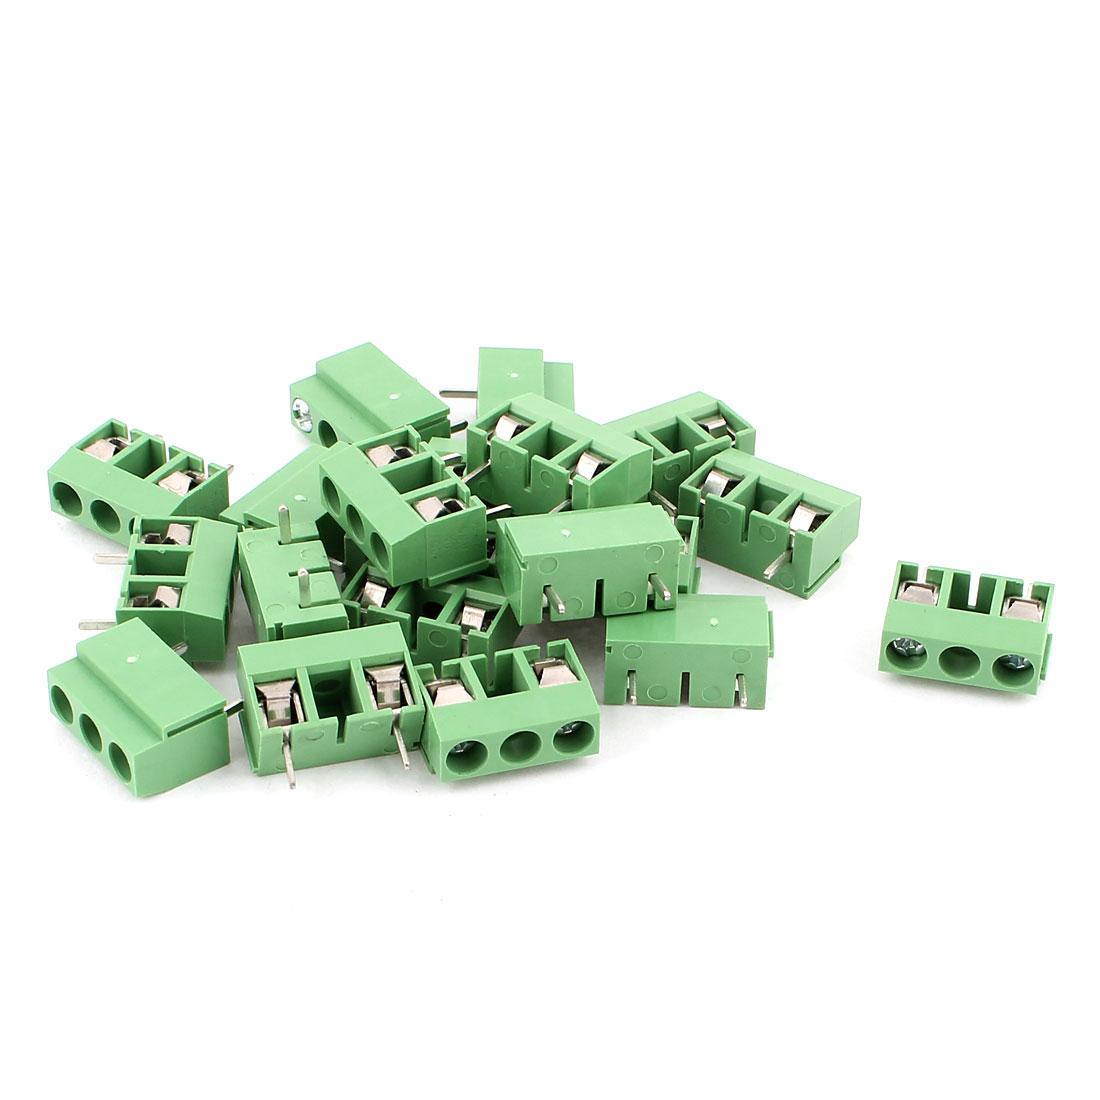 20 Pcs AC 300V 10A PCB Screw Terminal Block Connector 10mm Pitch Green